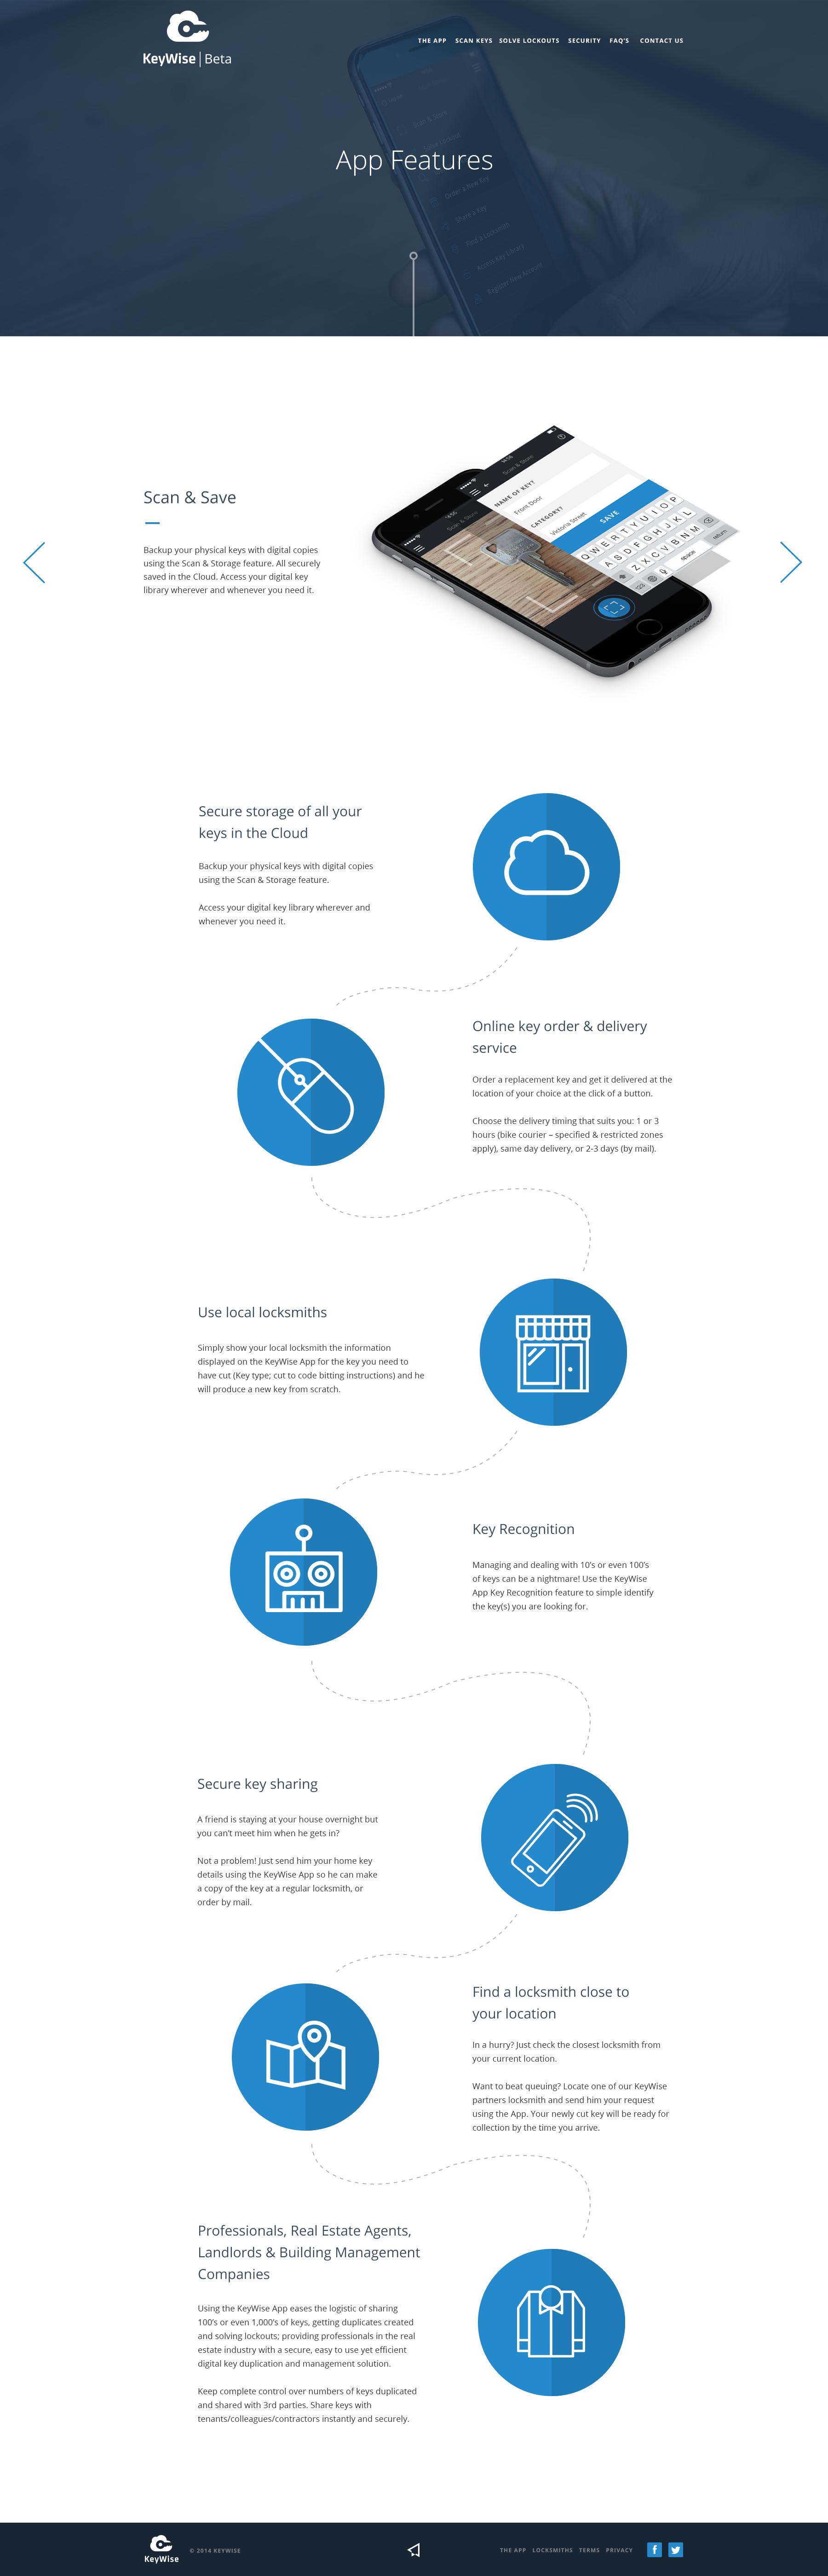 App features | UI Mobile | Pinterest | App, Web ui design and Web layout